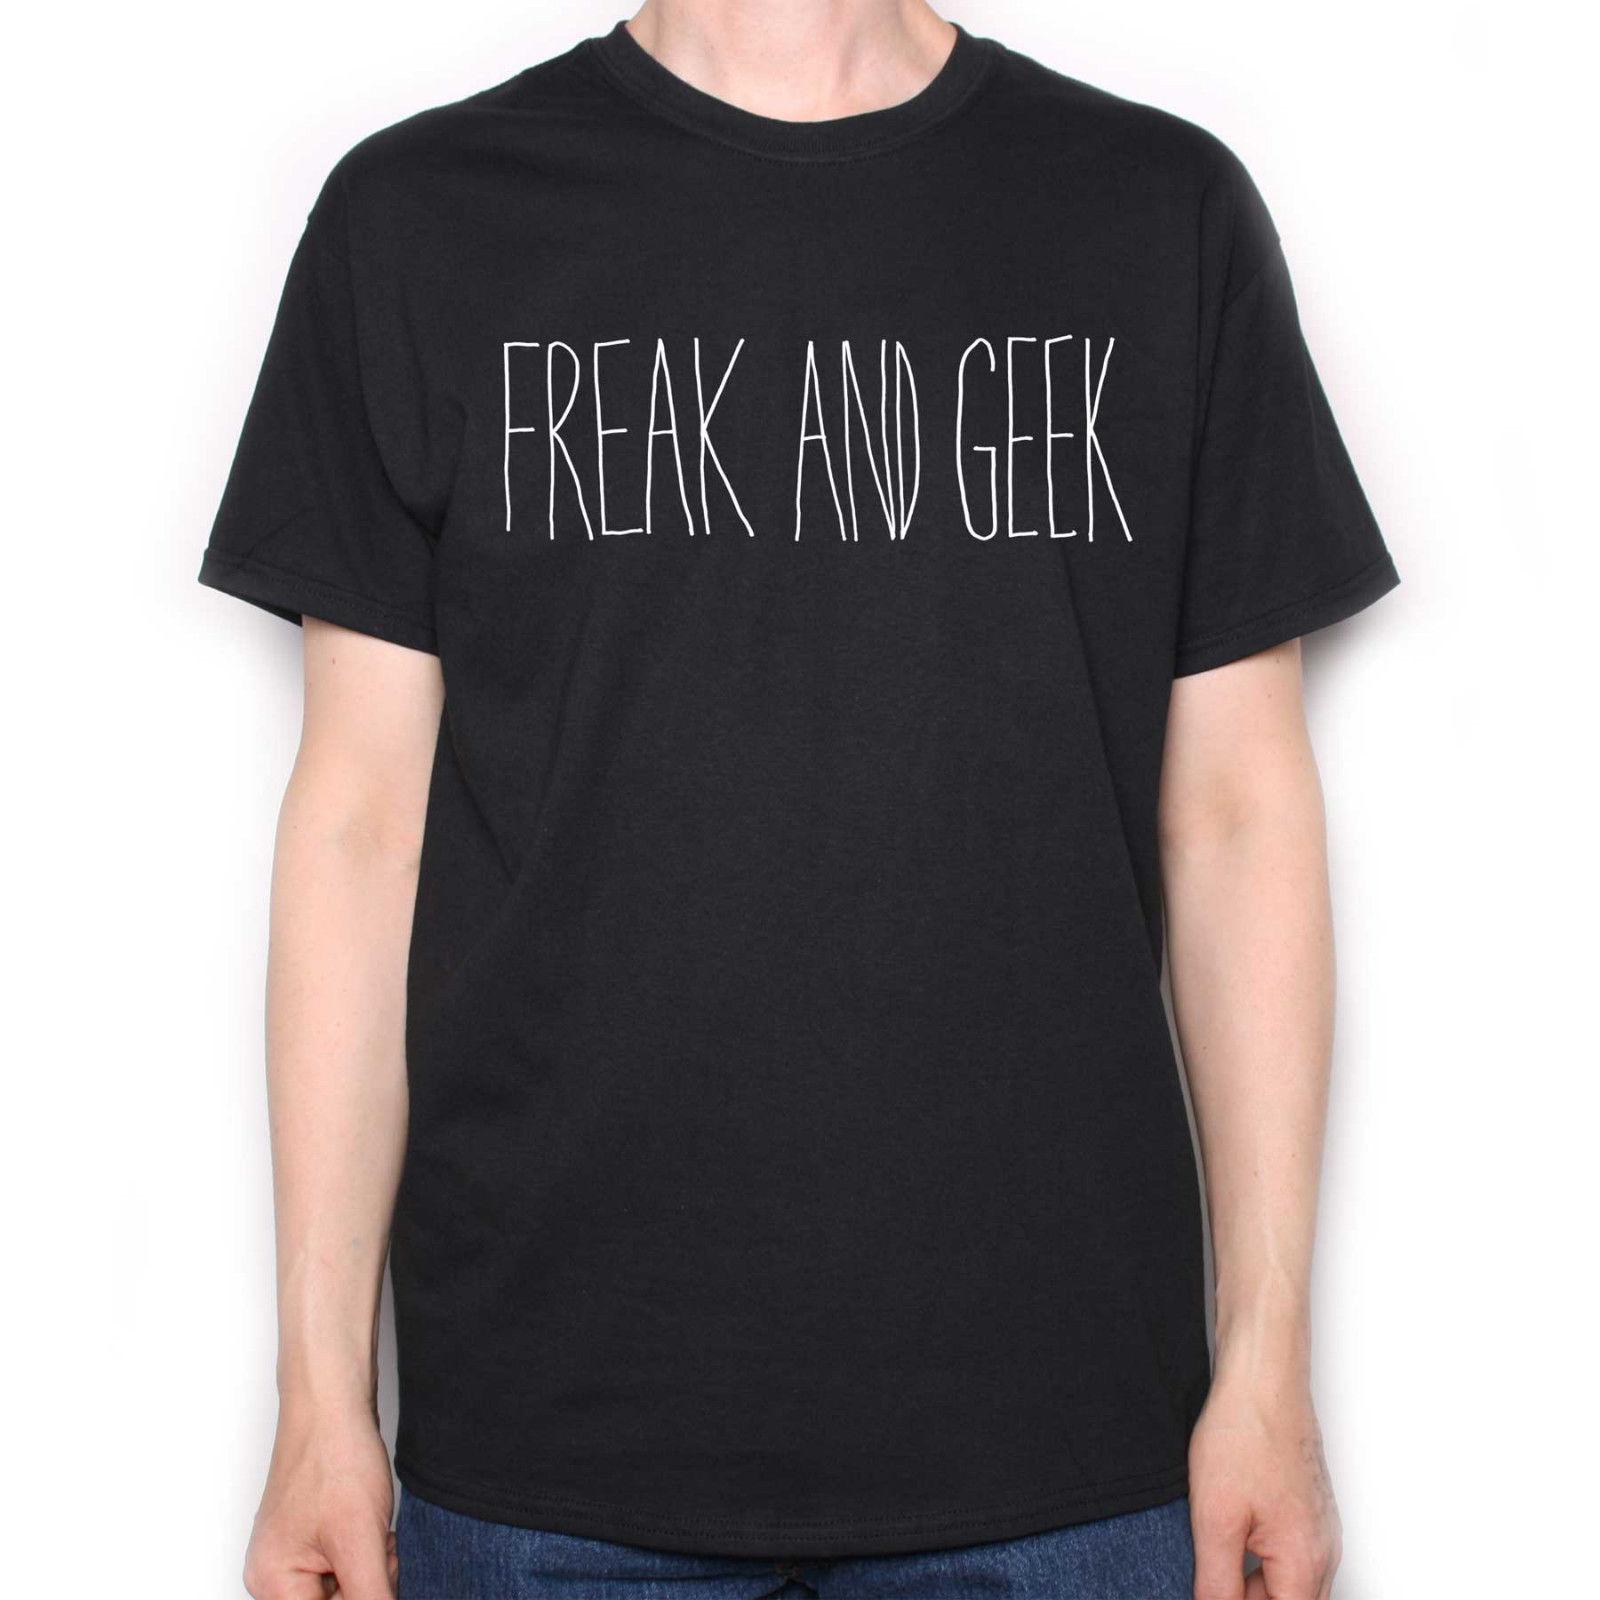 A Tribute To Freaks & Geeks T Shirt - Freak & Geek Cult TV Tribute Cheap wholesale tees Casual Short Sleeve TEE mens tee shirts